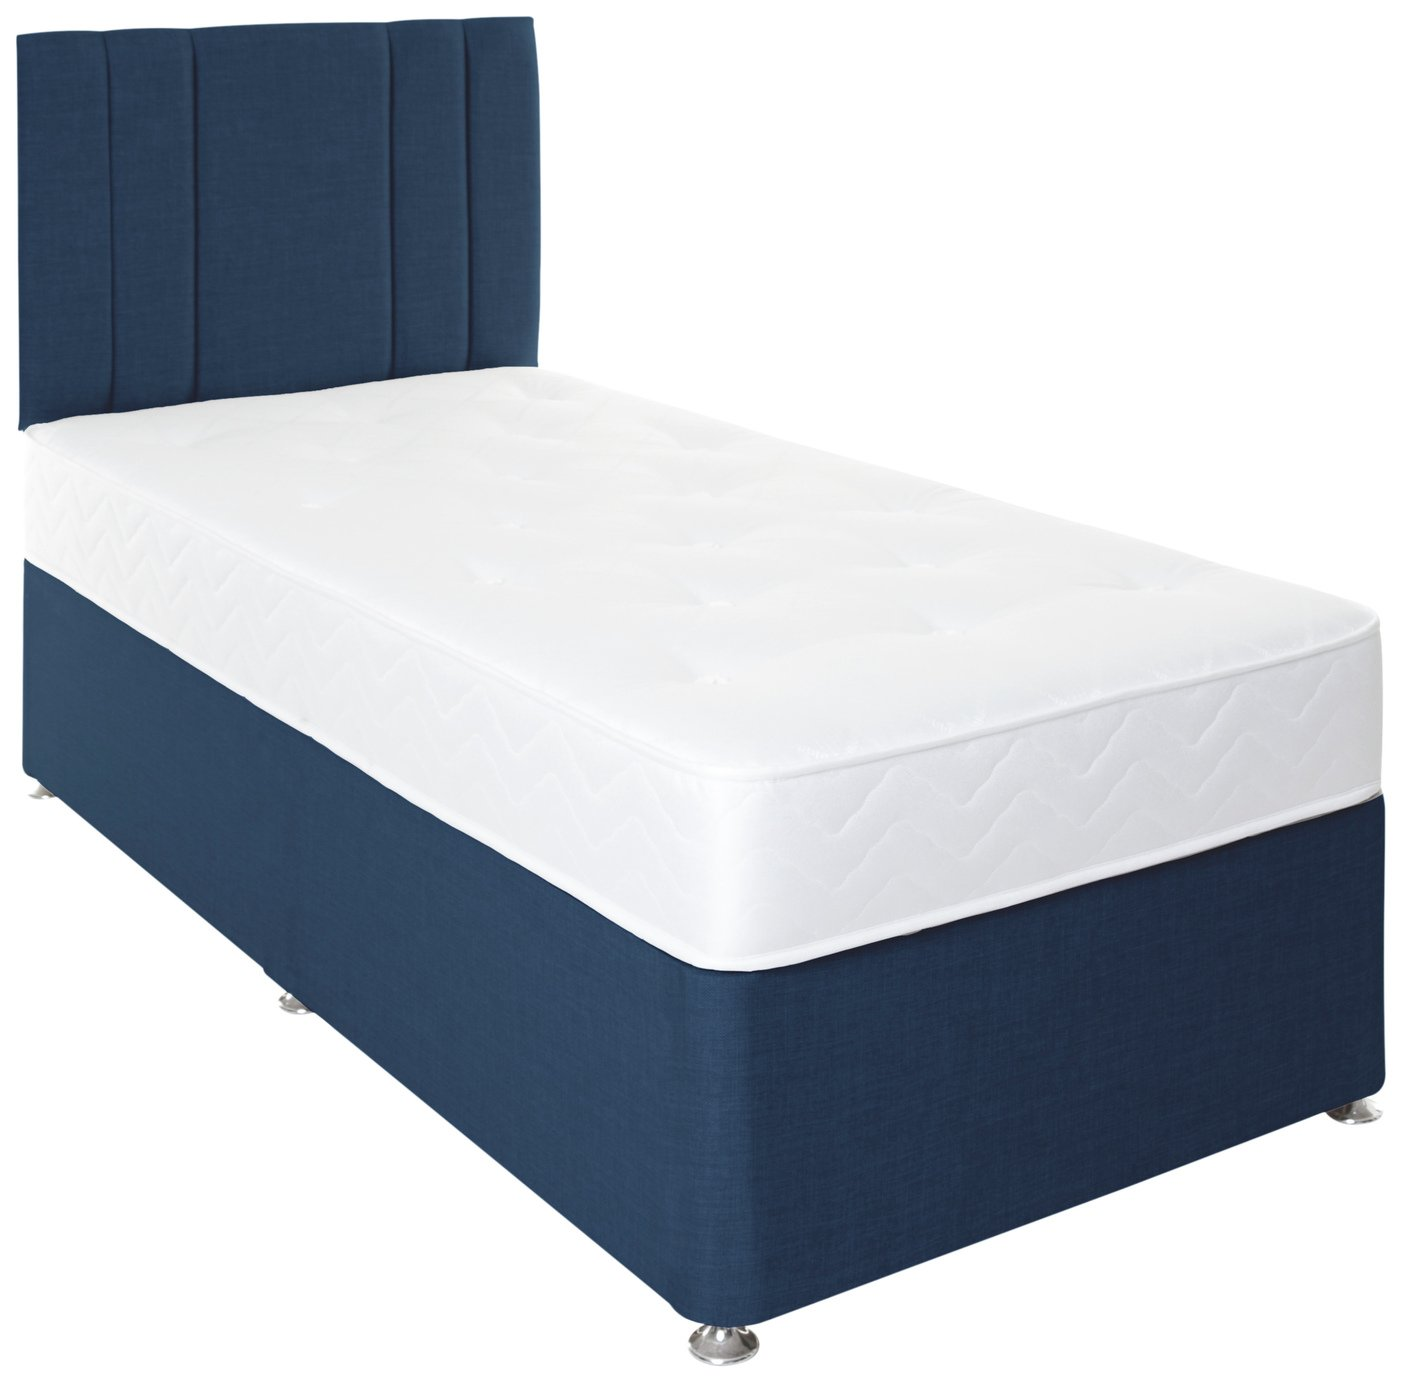 Airpsrung Henlow 1200 Pocket Divan Bed & Headboard - Blue at Argos